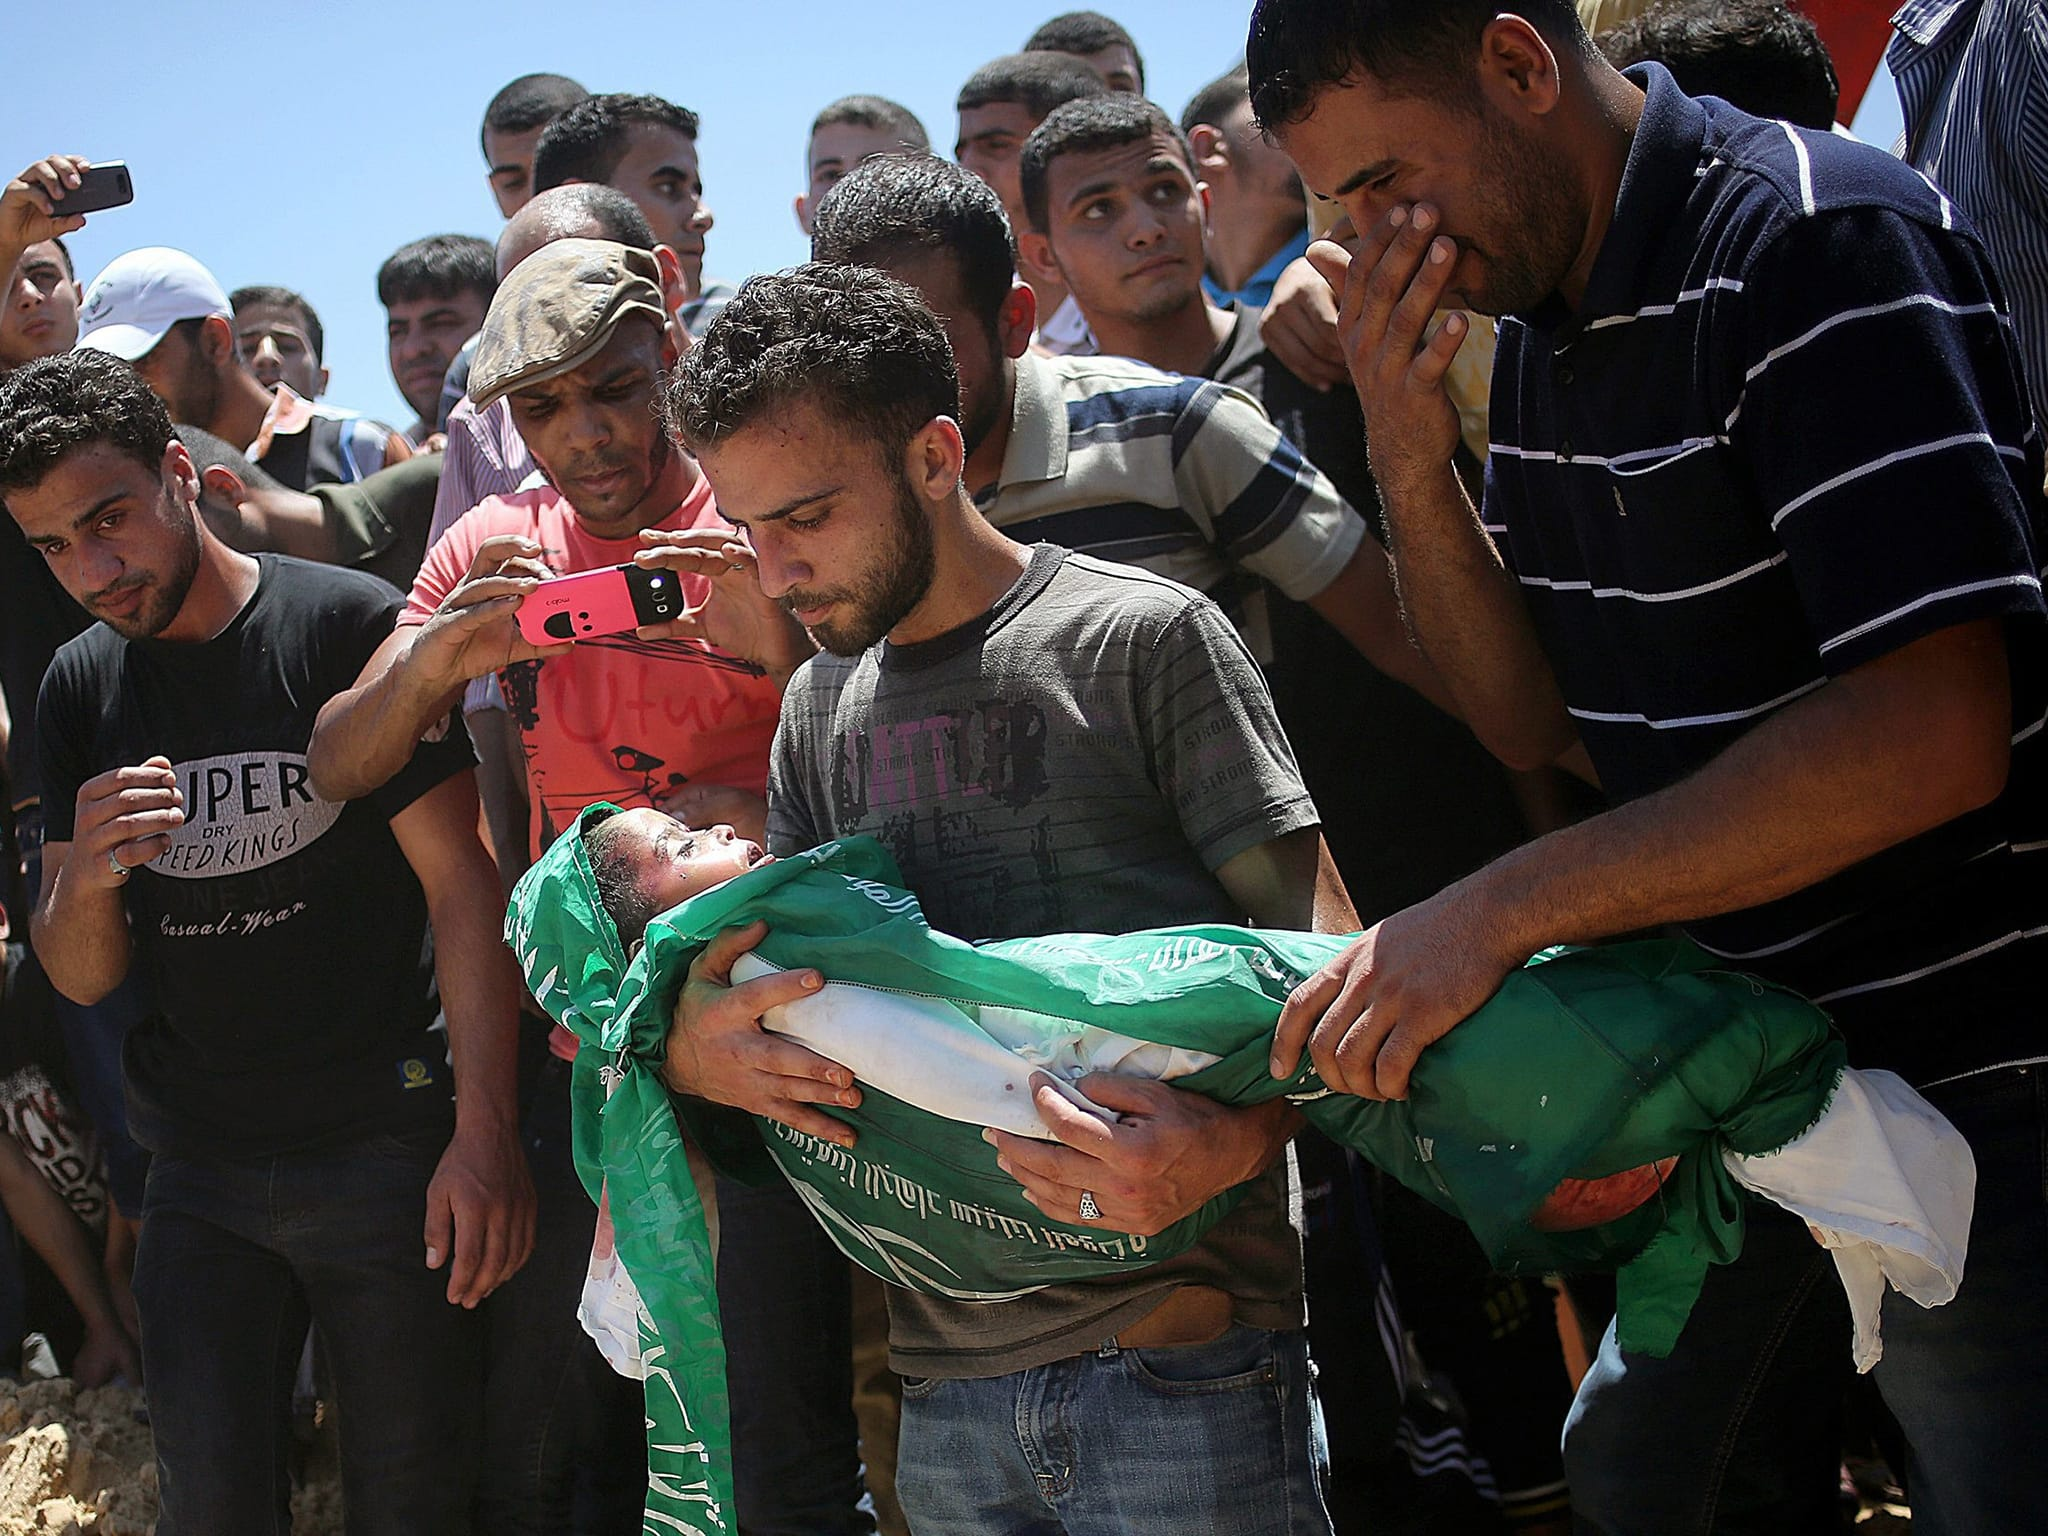 Deputati pd sel a gaza catastrofe umanitaria costruire for Deputati pd